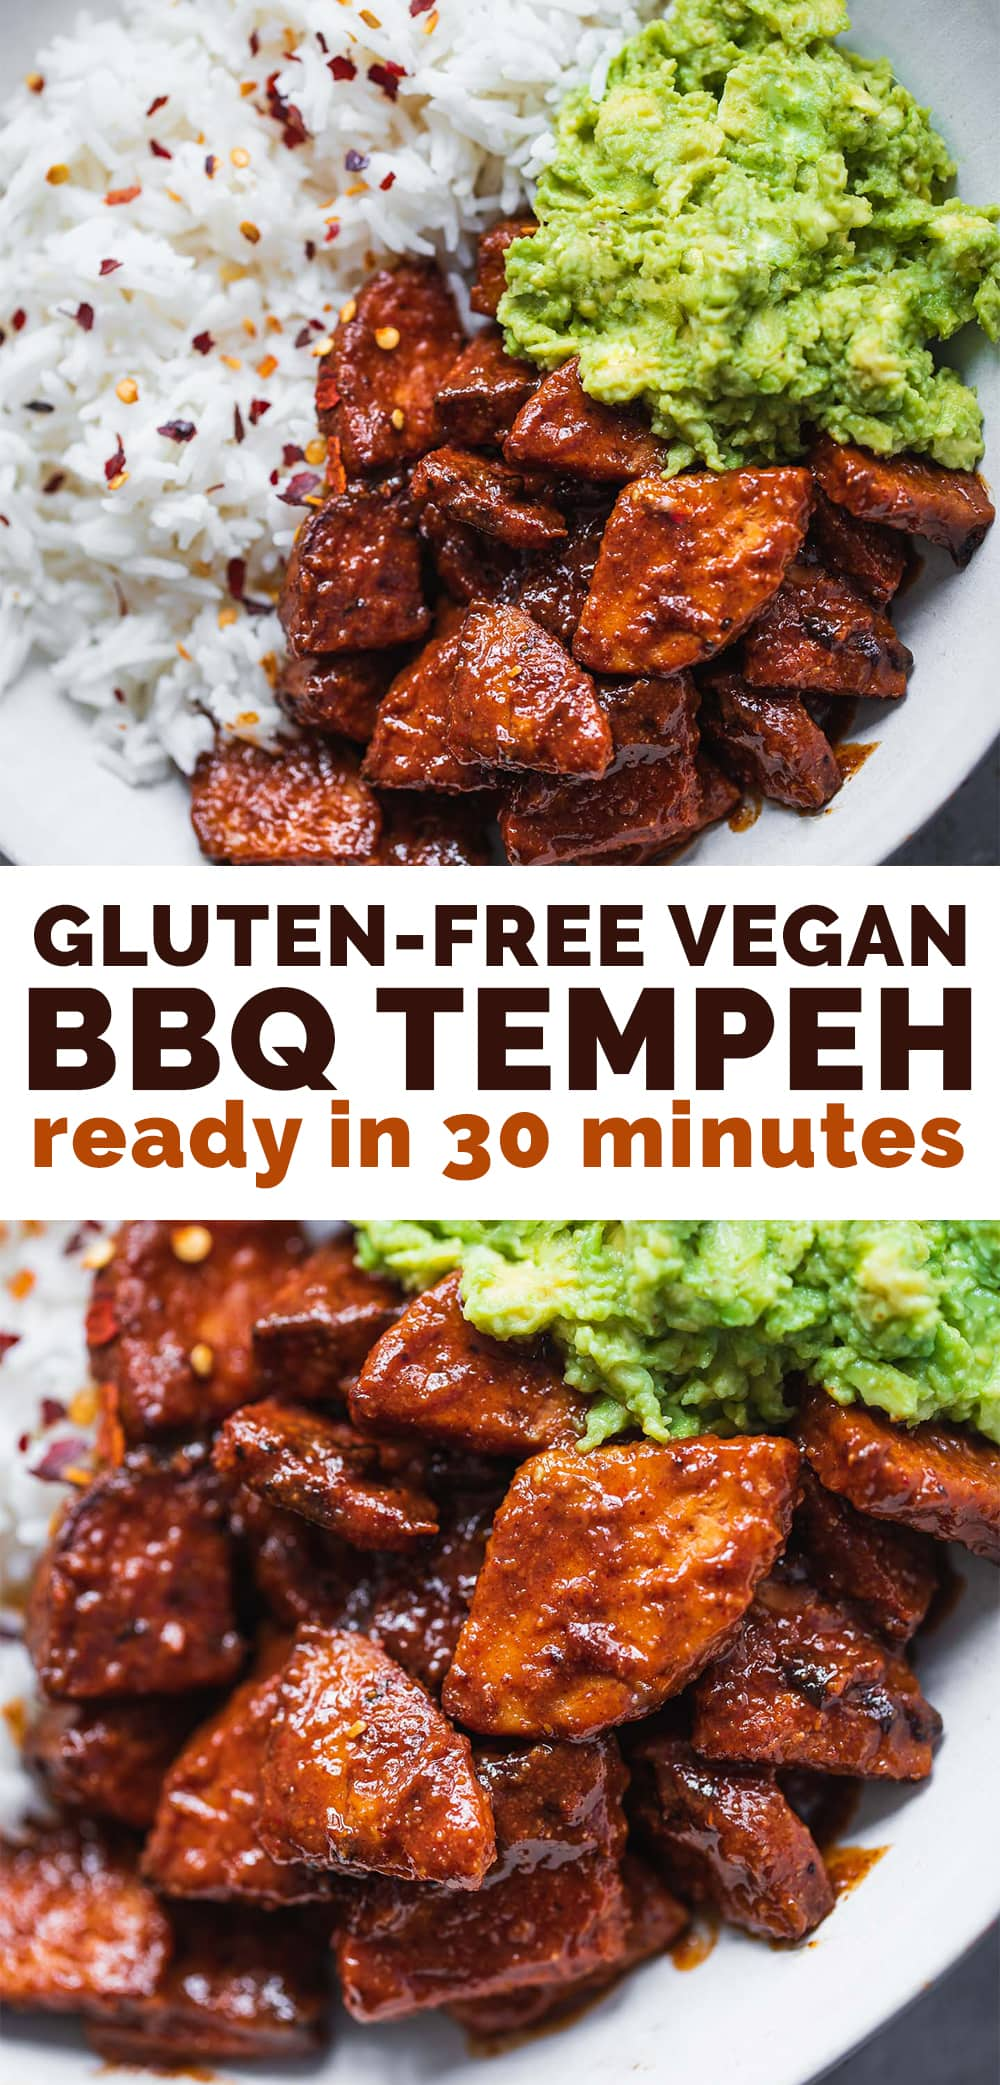 Vegan BBQ tempeh gluten-free